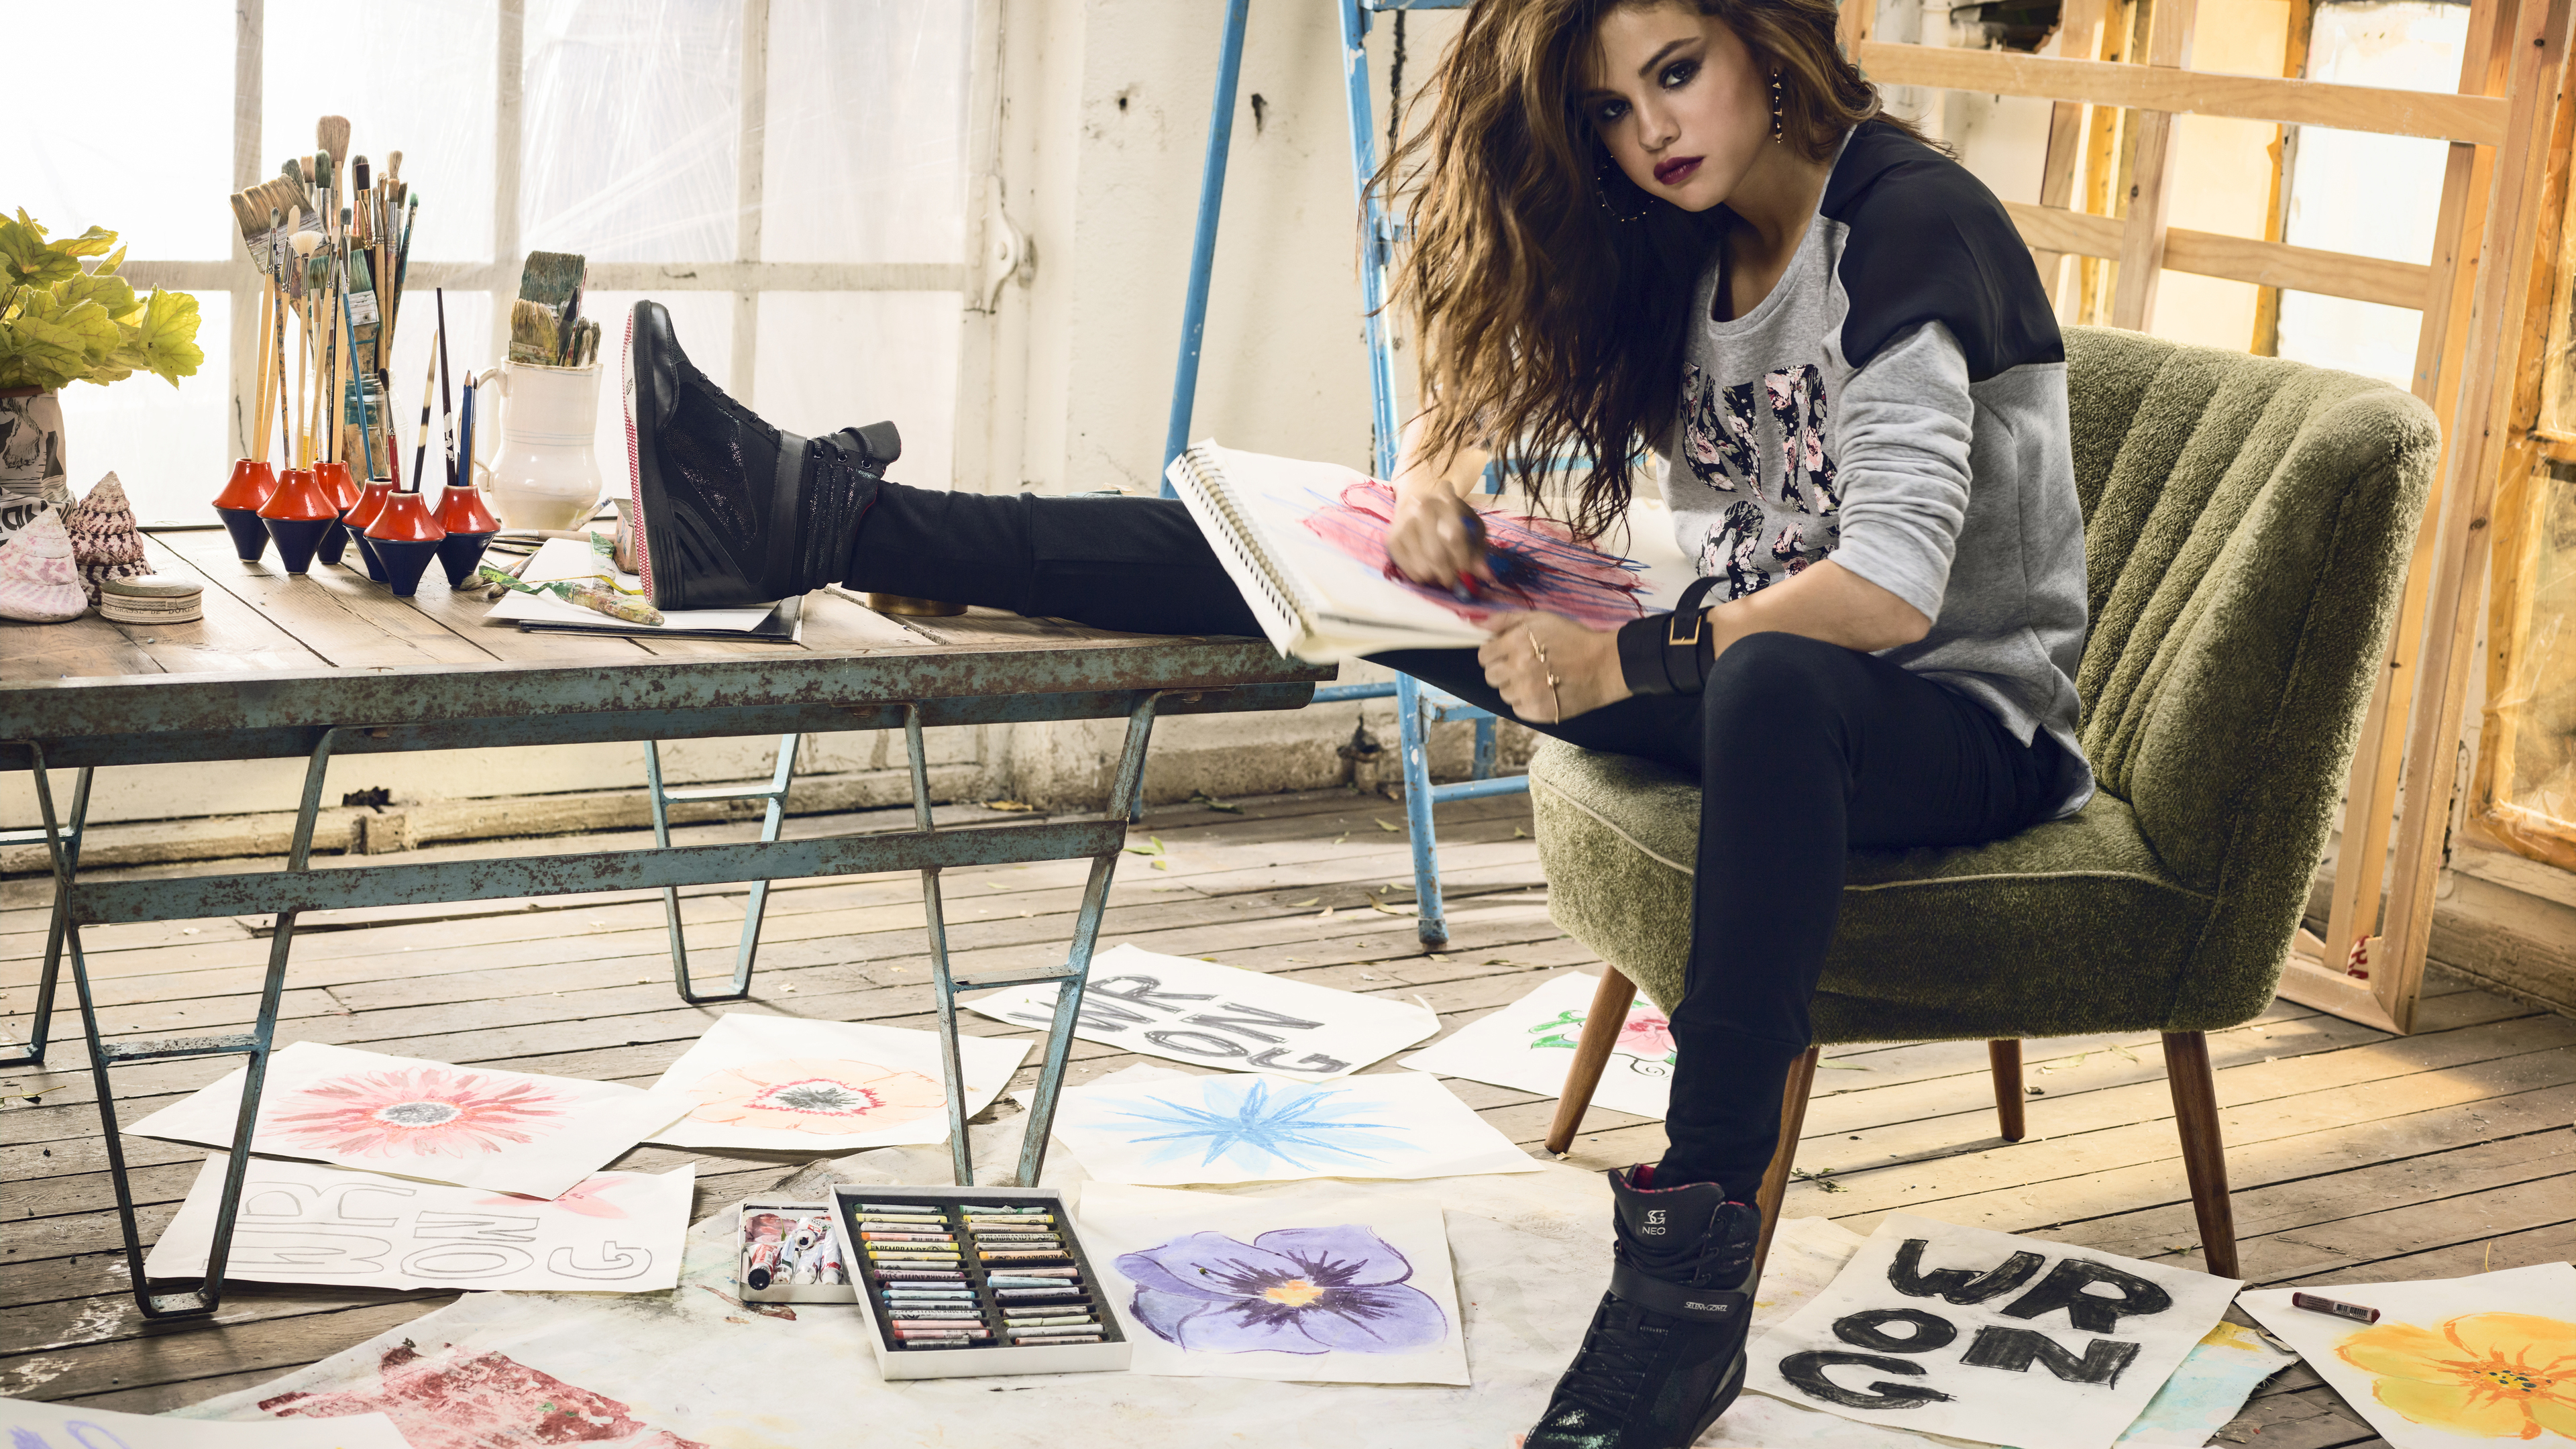 selena gomez adidas 4k 5k 1536944709 - Selena Gomez Adidas 4k 5k - selena gomez wallpapers, music wallpapers, hd-wallpapers, girls wallpapers, celebrities wallpapers, adidas wallpapers, 5k wallpapers, 4k-wallpapers